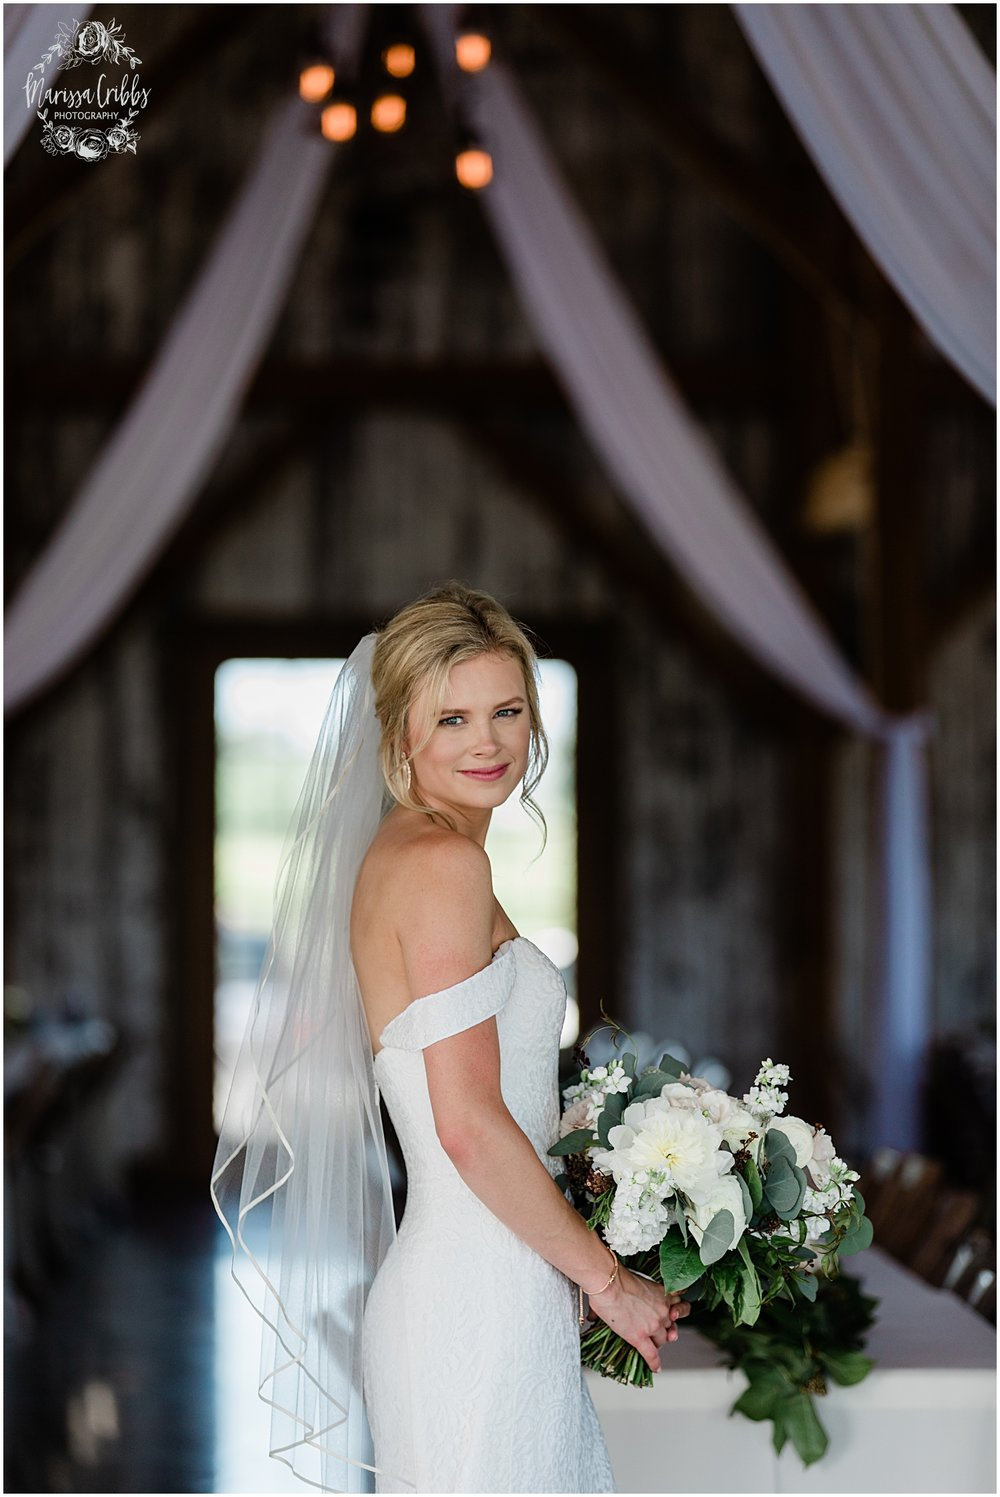 RHODES WEDDING | WESTON RED BARN FARM | MARISSA CRIBBS PHOTOGRAPHY_5250.jpg